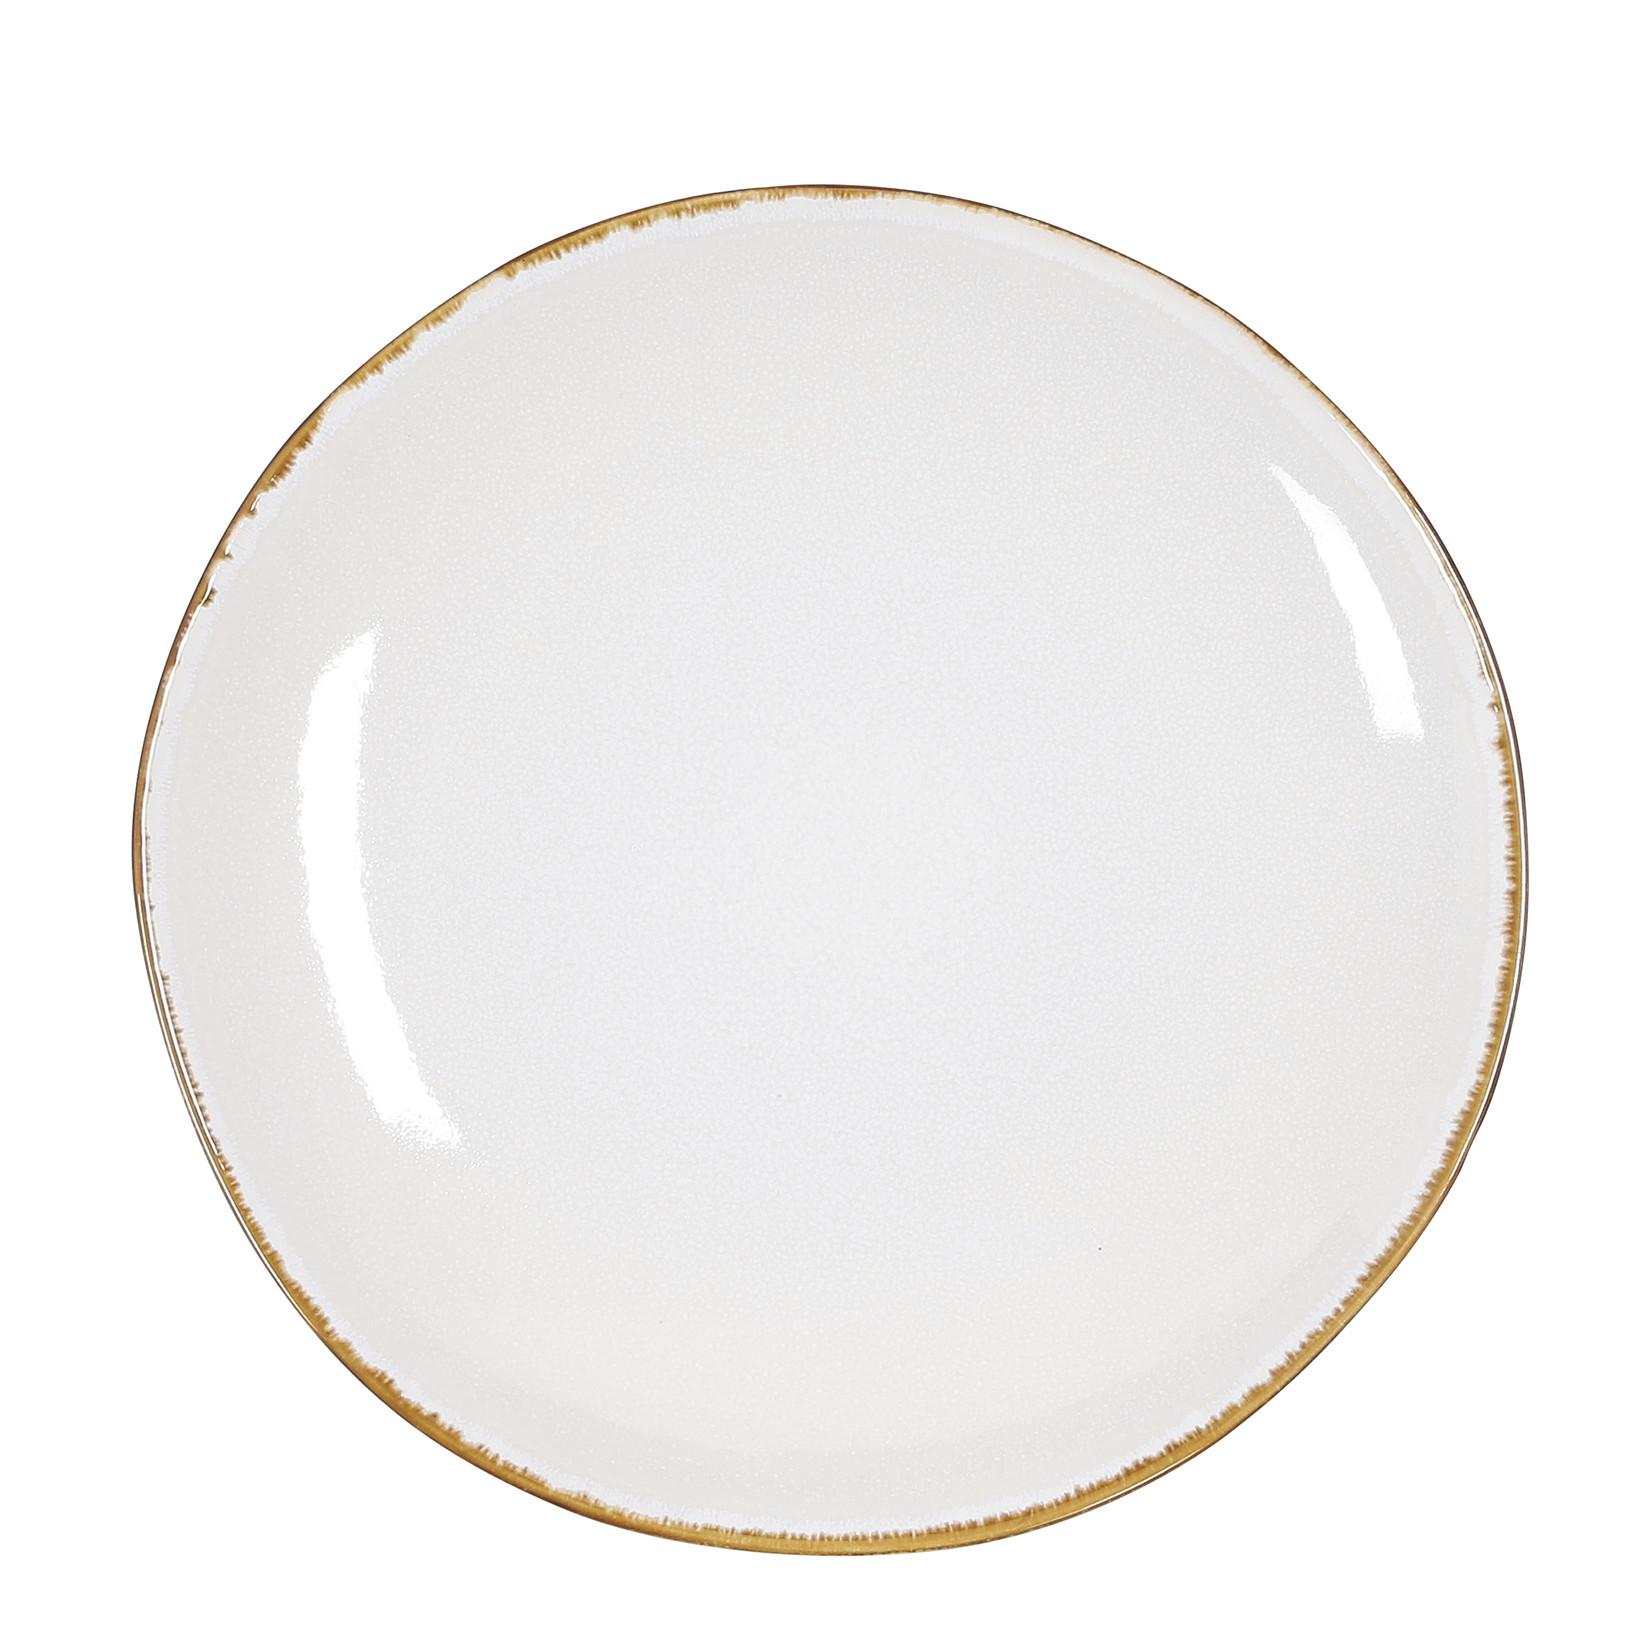 MiCa Tabo Diner plate white